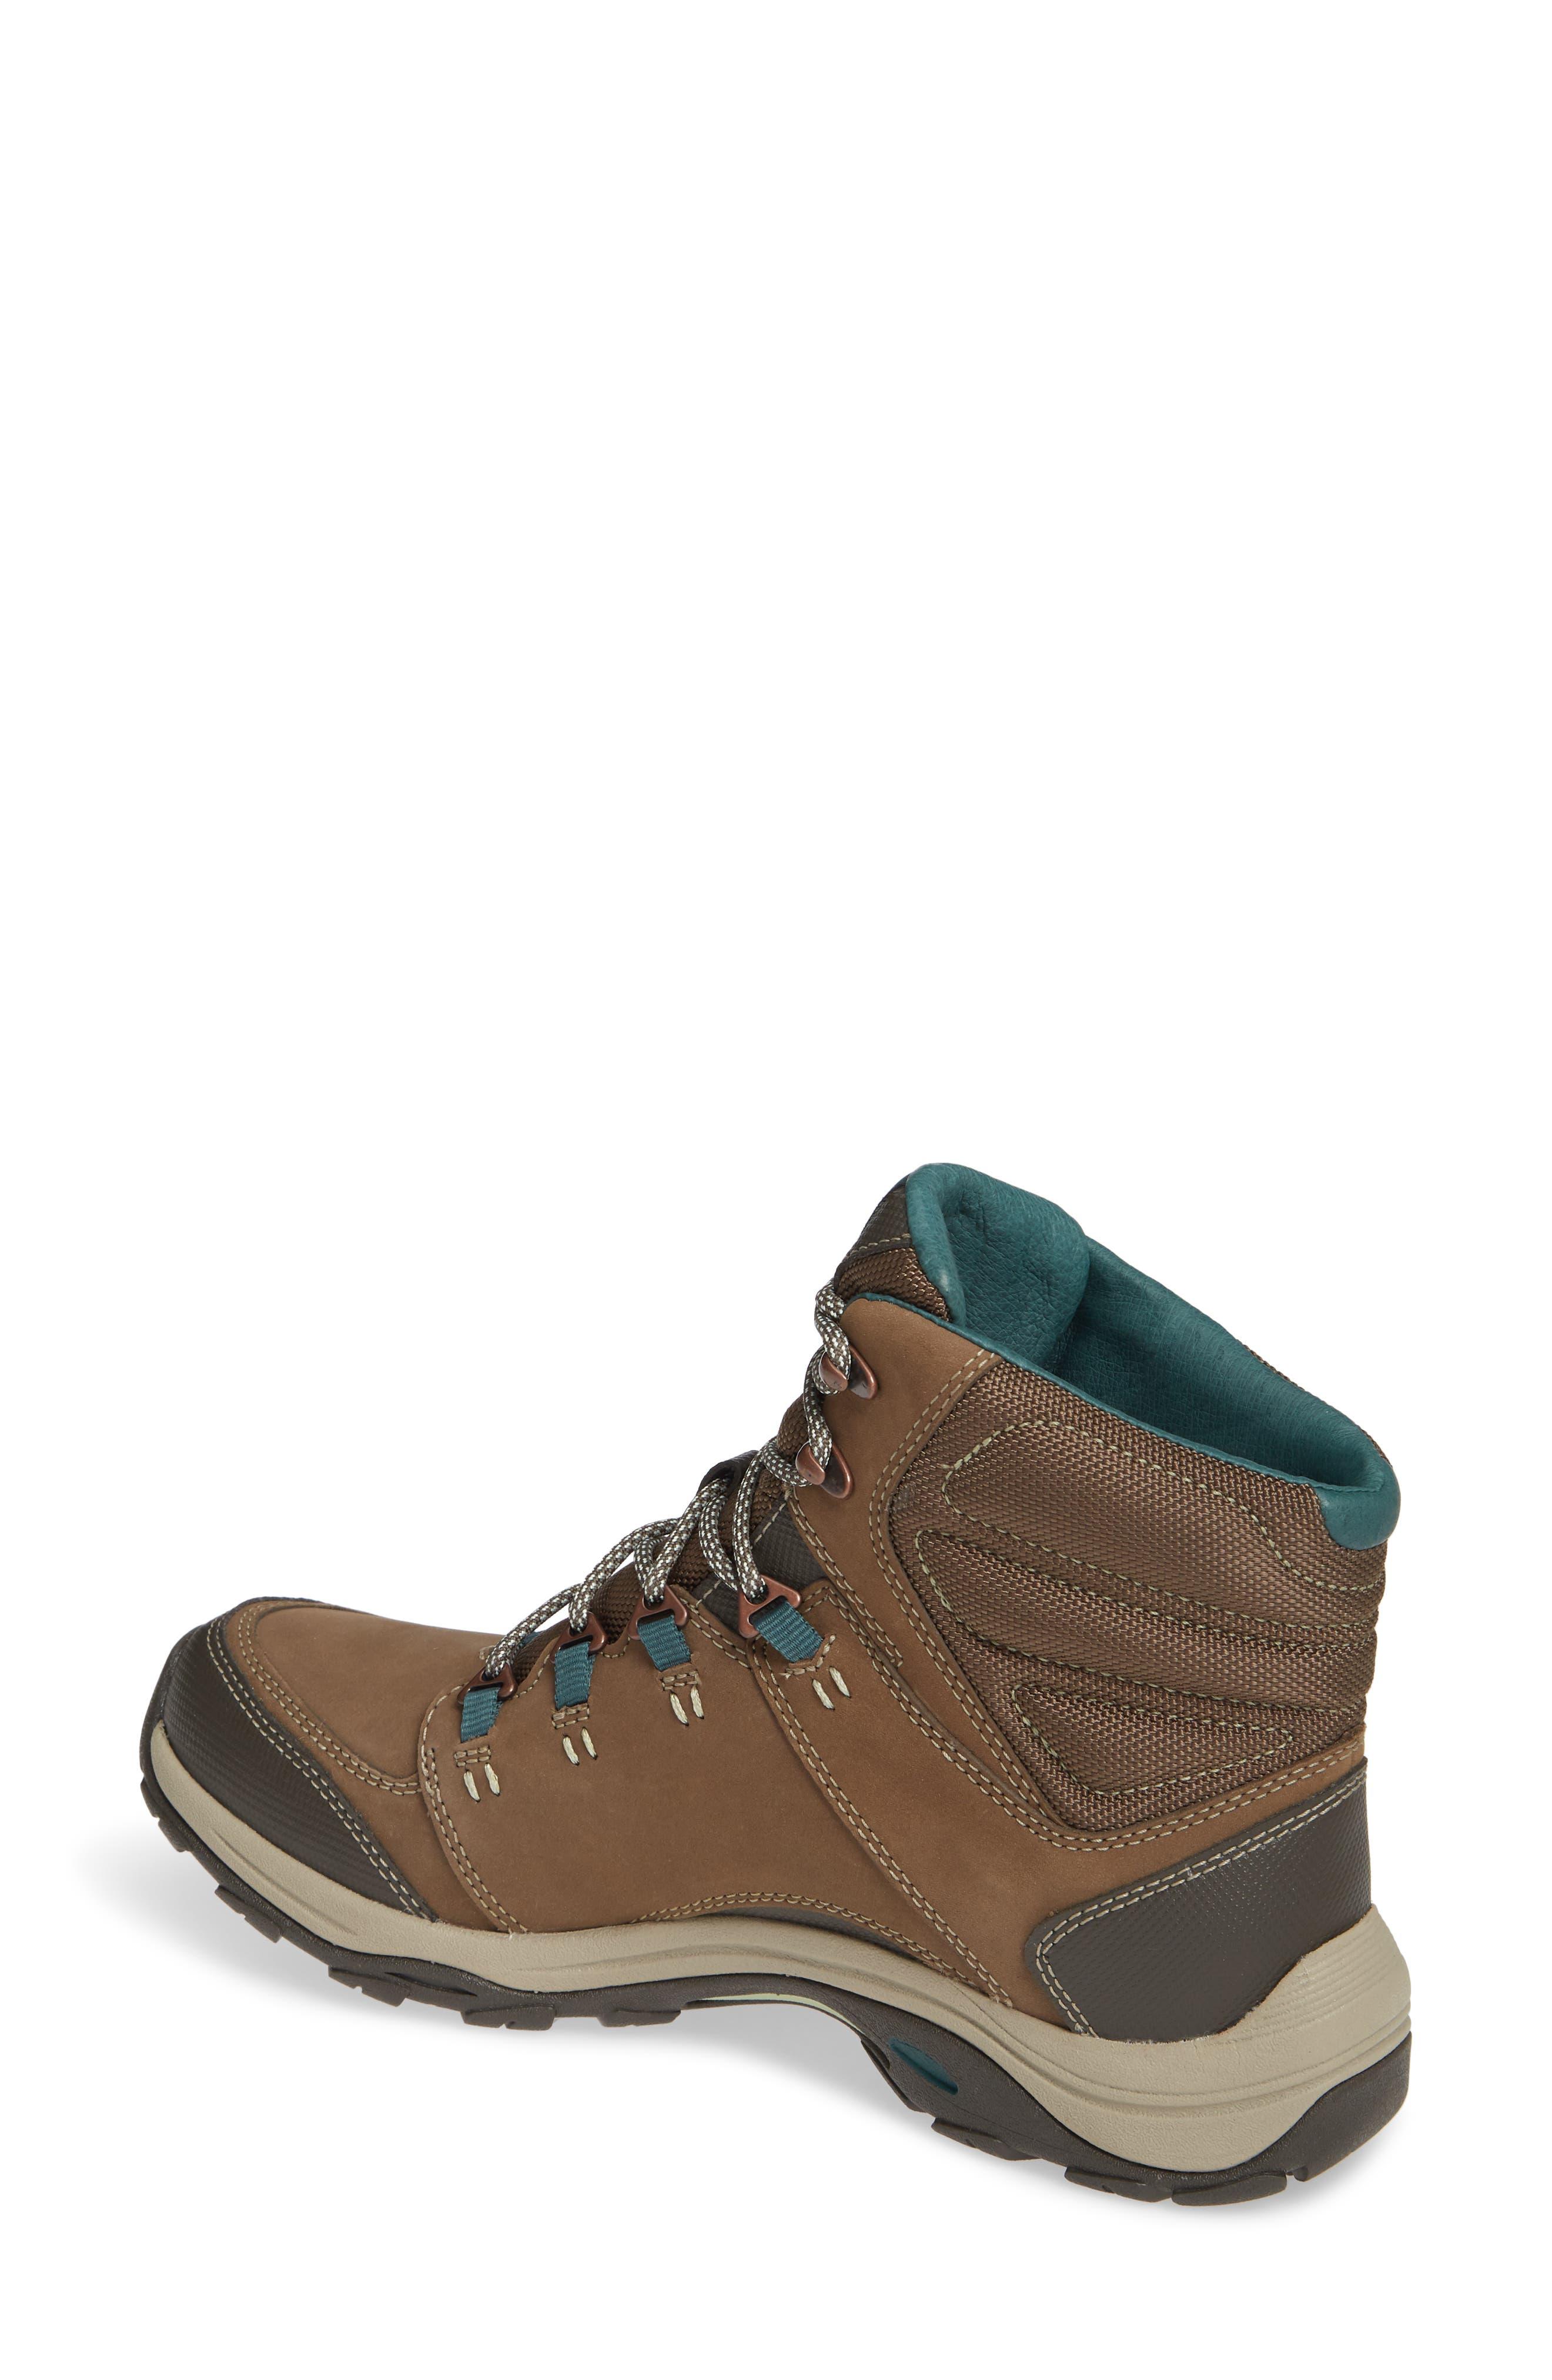 Ahnu by Teva Montara III Waterproof Hiking Boot,                             Alternate thumbnail 2, color,                             CHOCOLATE CHIP NUBUCK LEATHER